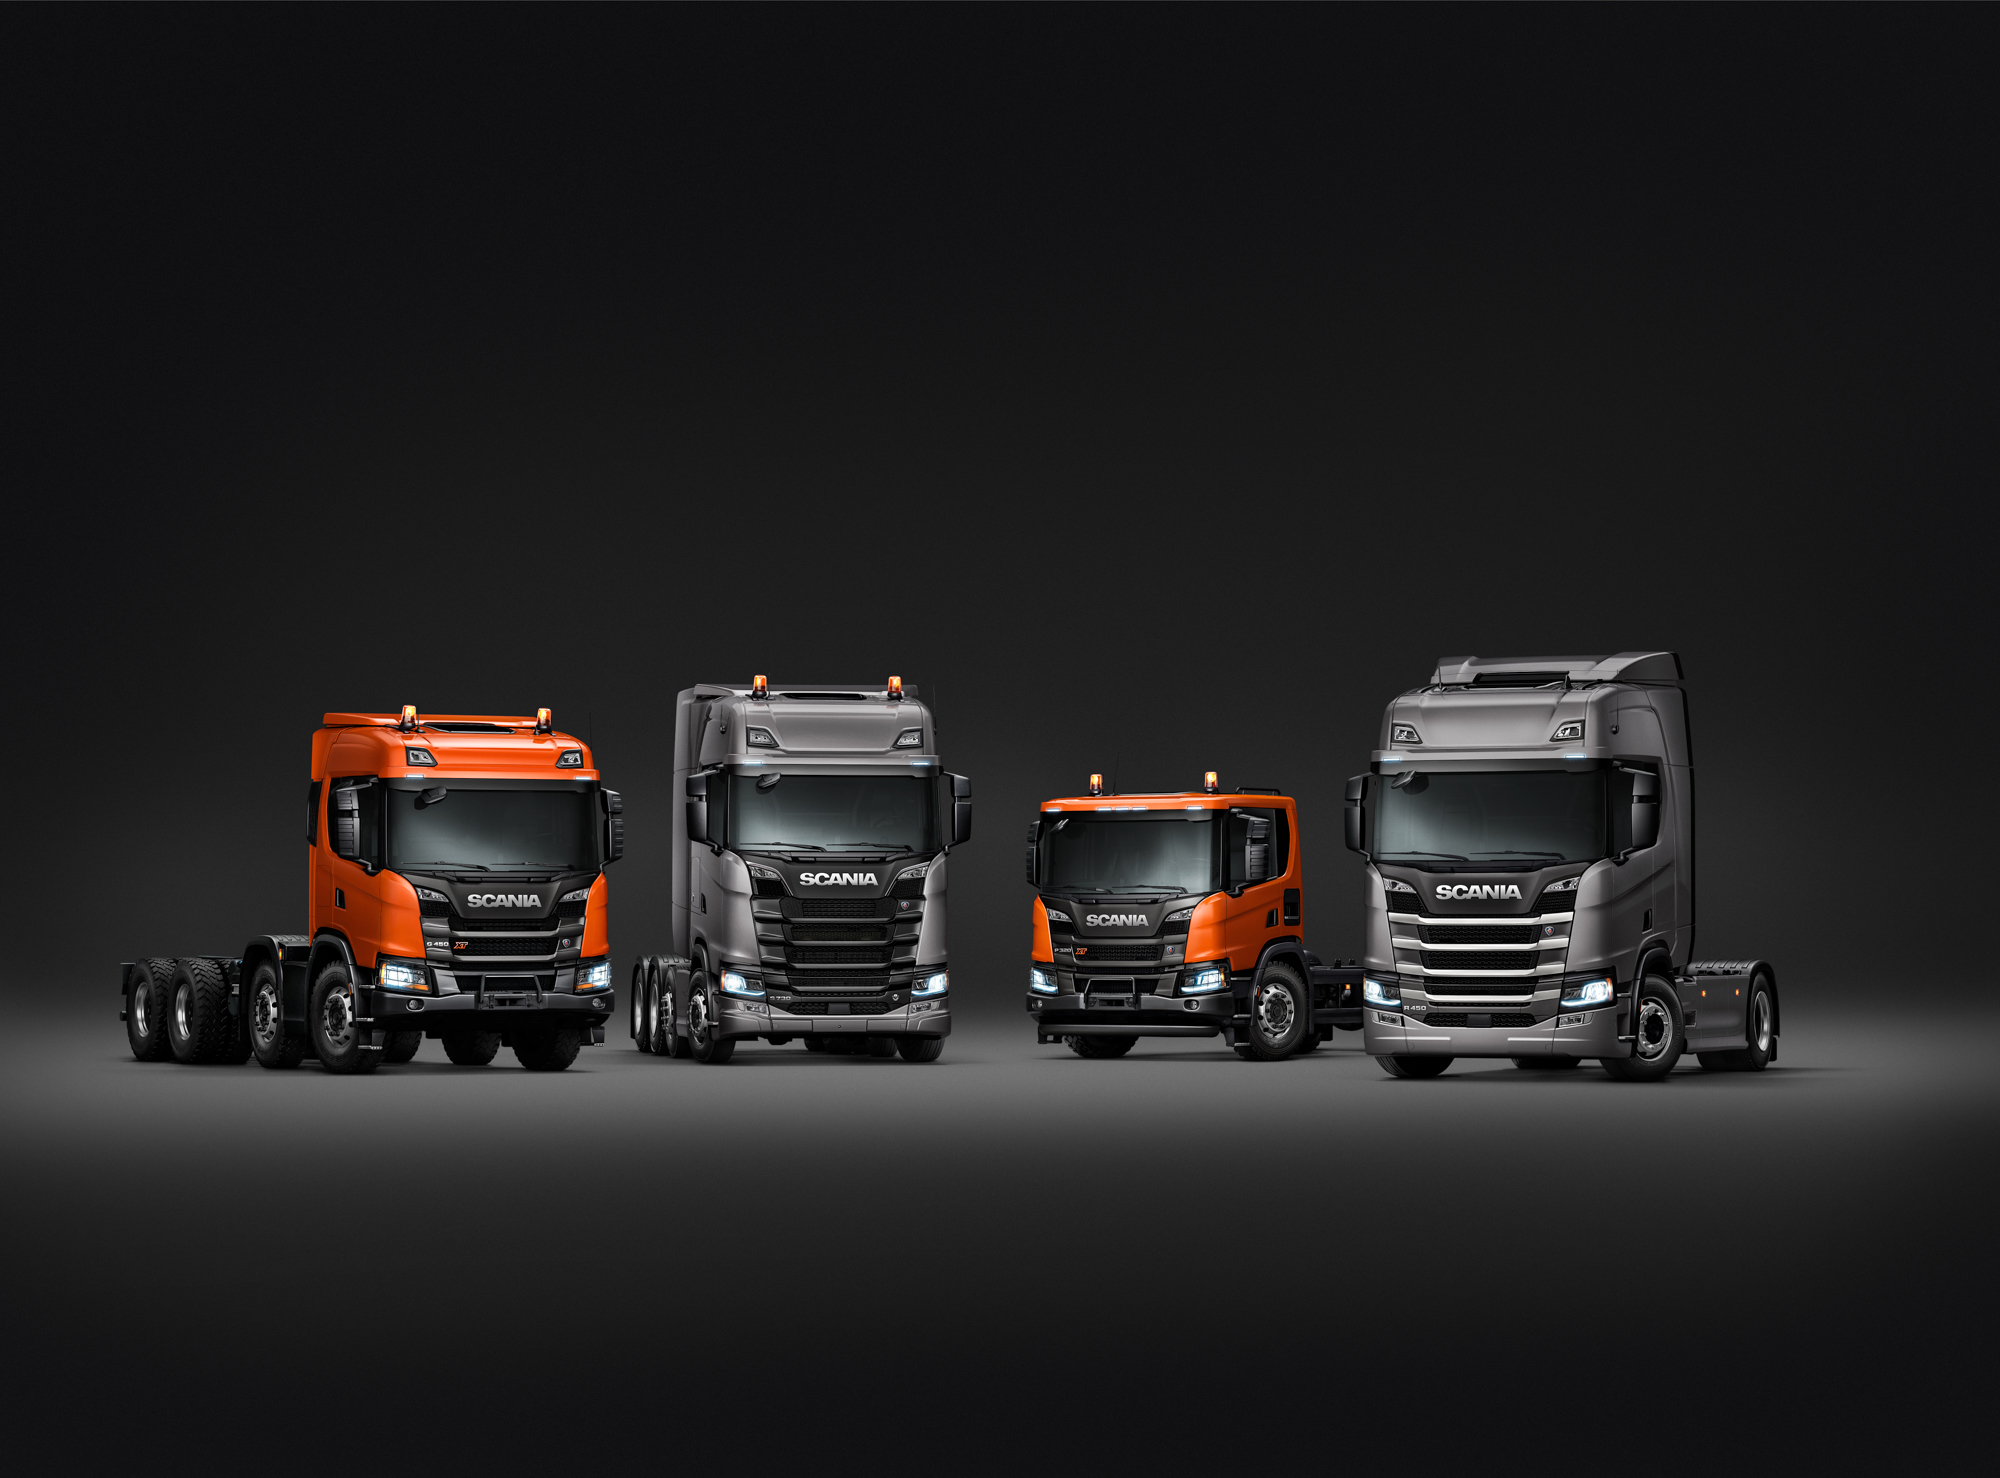 Scania_Trucks_Construction_001_Low.JPG